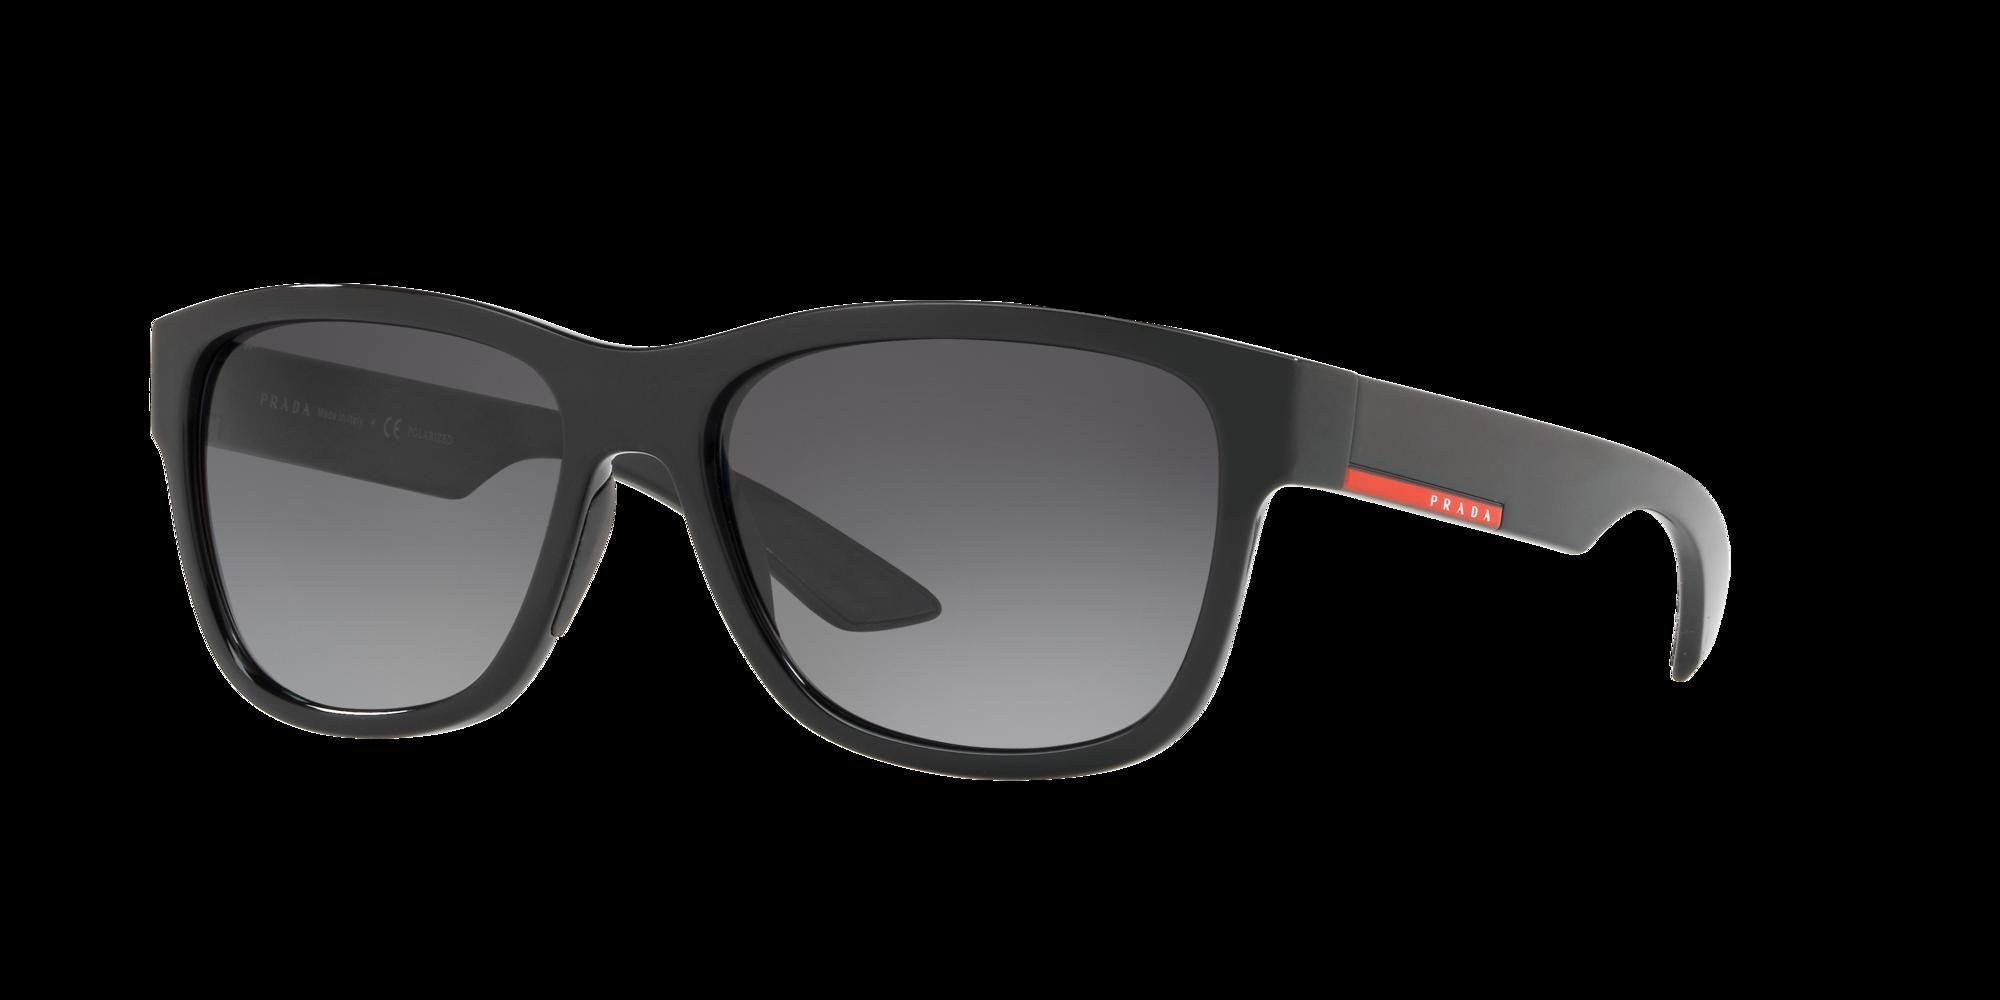 Prada Linea Rossa Unisex  PS 03QS -  Frame color: Negro, Lens color: Gris-Negro, Size 57-17/145